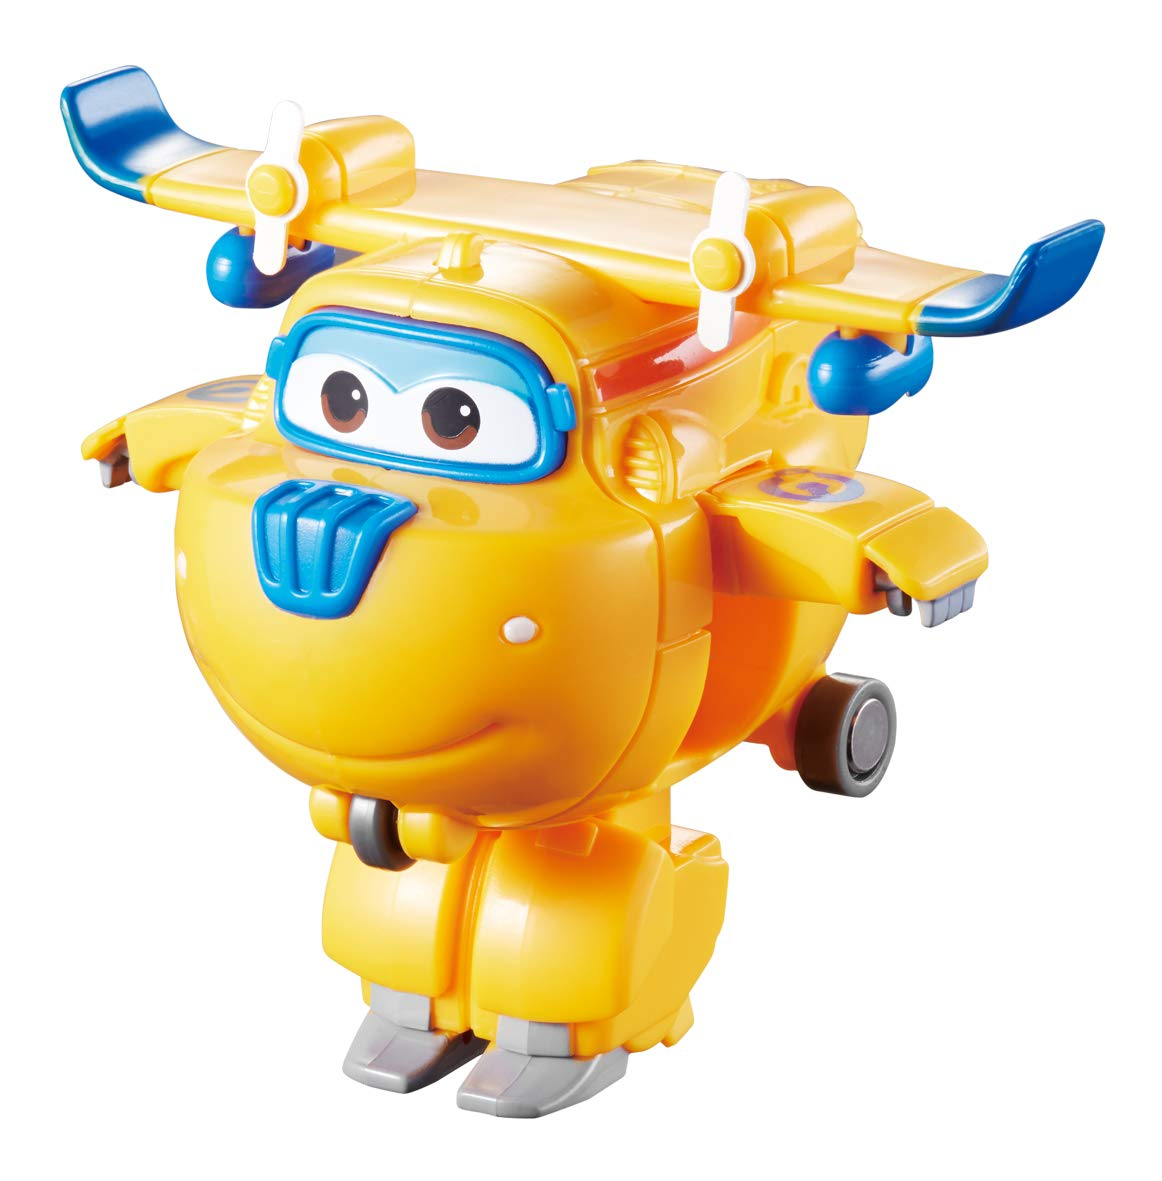 Super Wings US720040D Transforming Toy Figures, Poppa Wheel, Dizzy, Jett, & Donnie, 2'' Scale